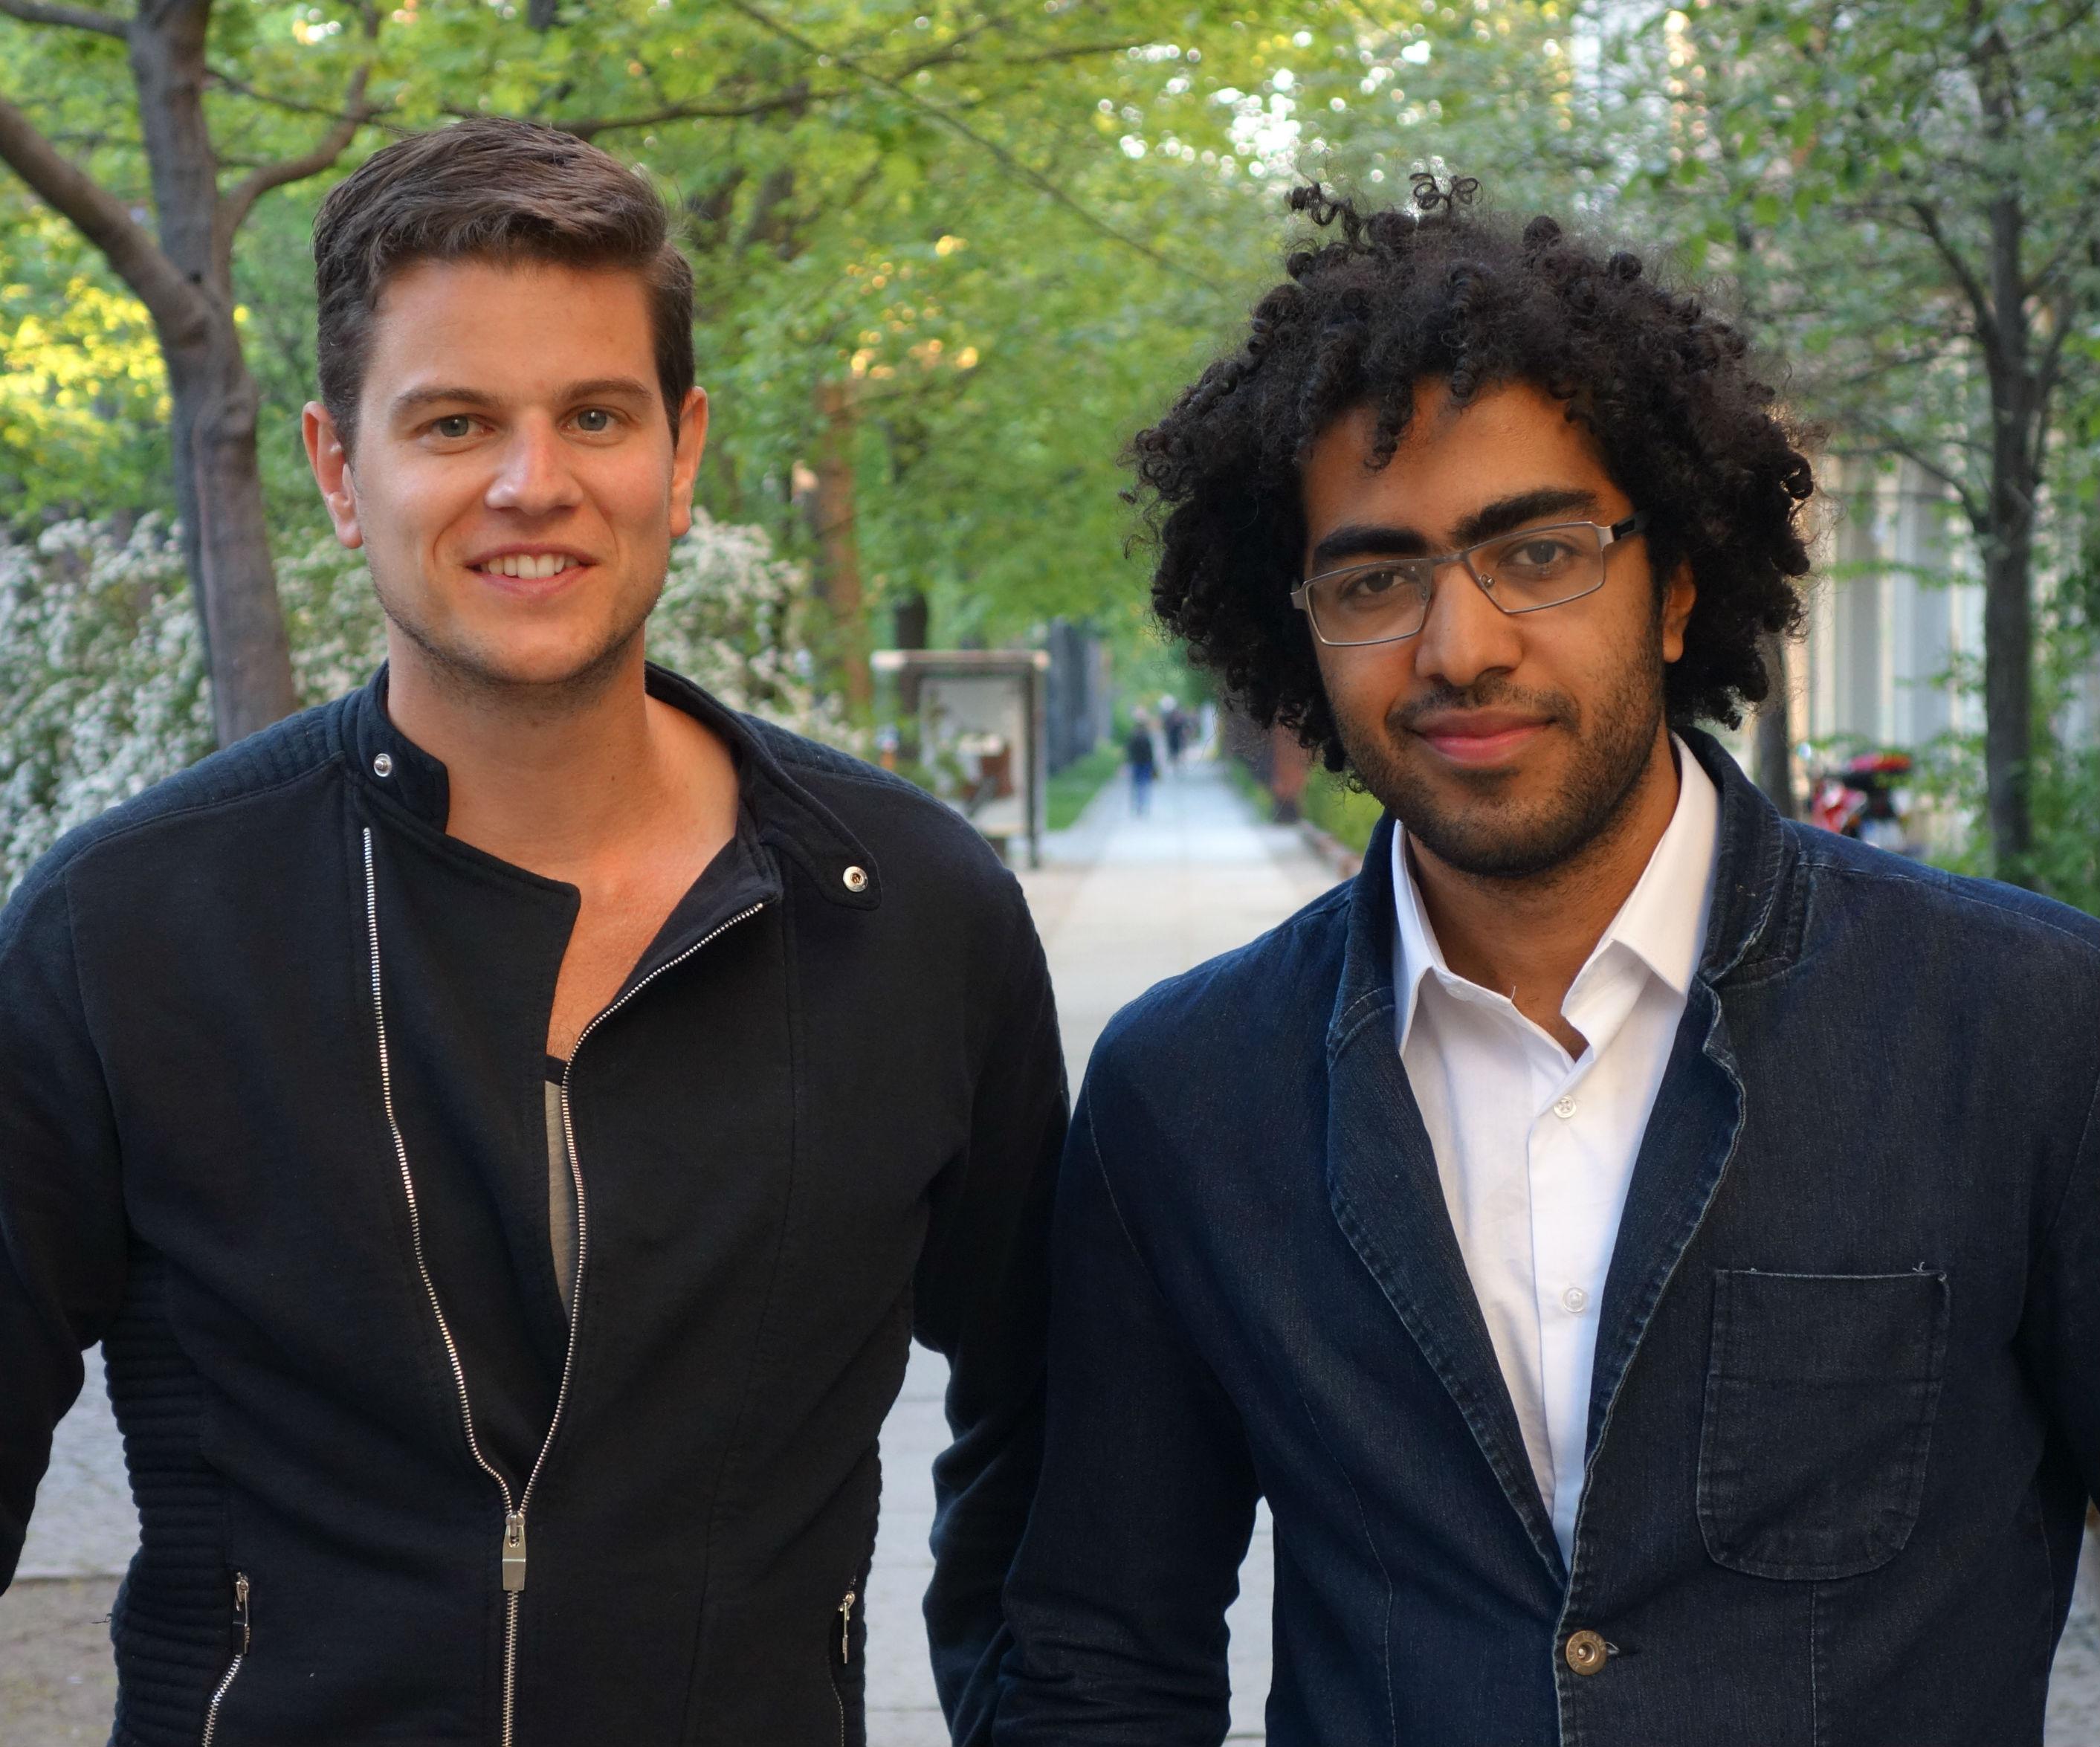 Lucas Bighetti and Jan van der Aa